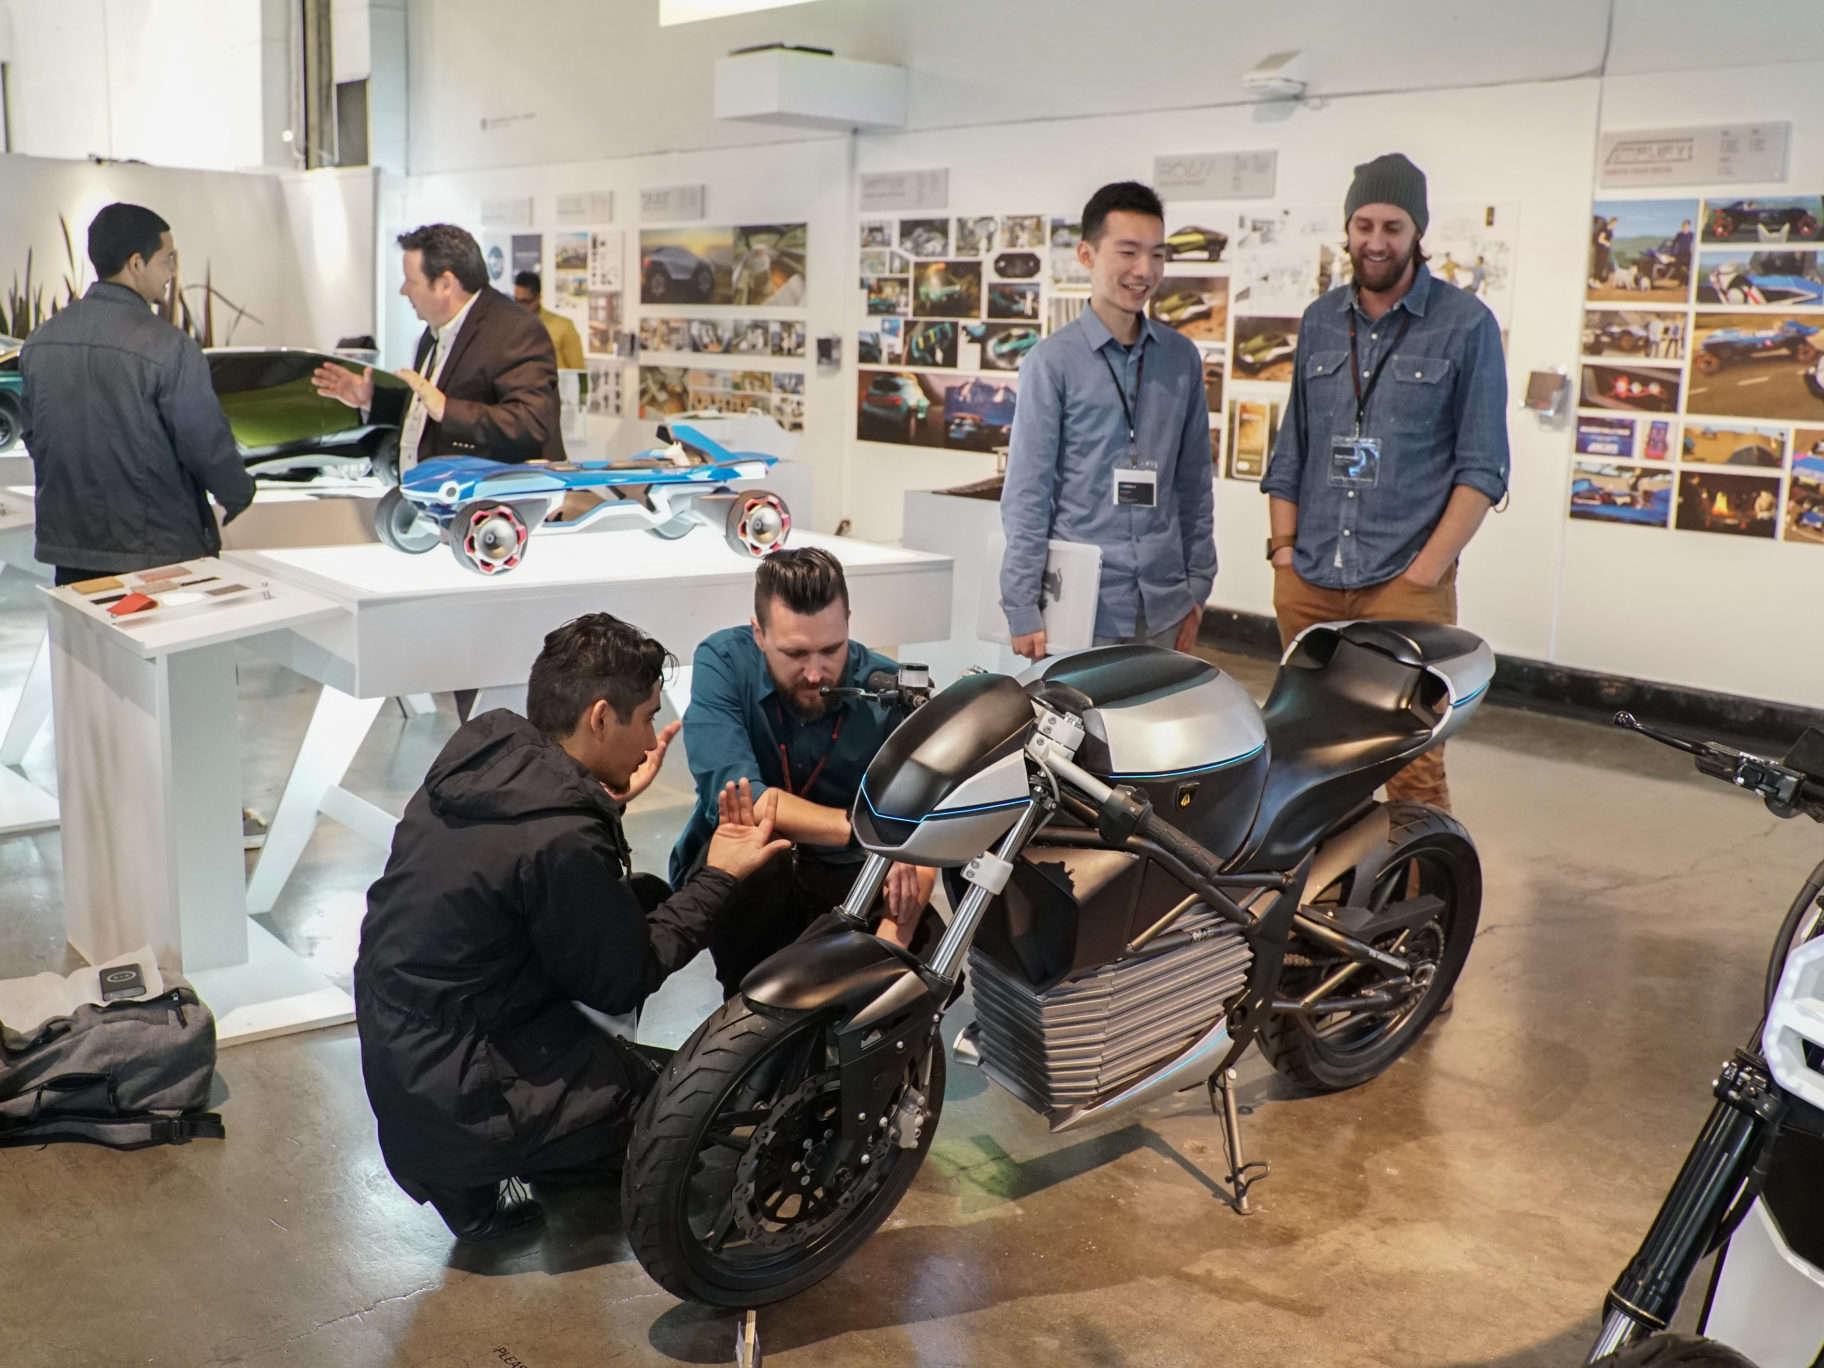 Spring Show Industrial Design Exhibit